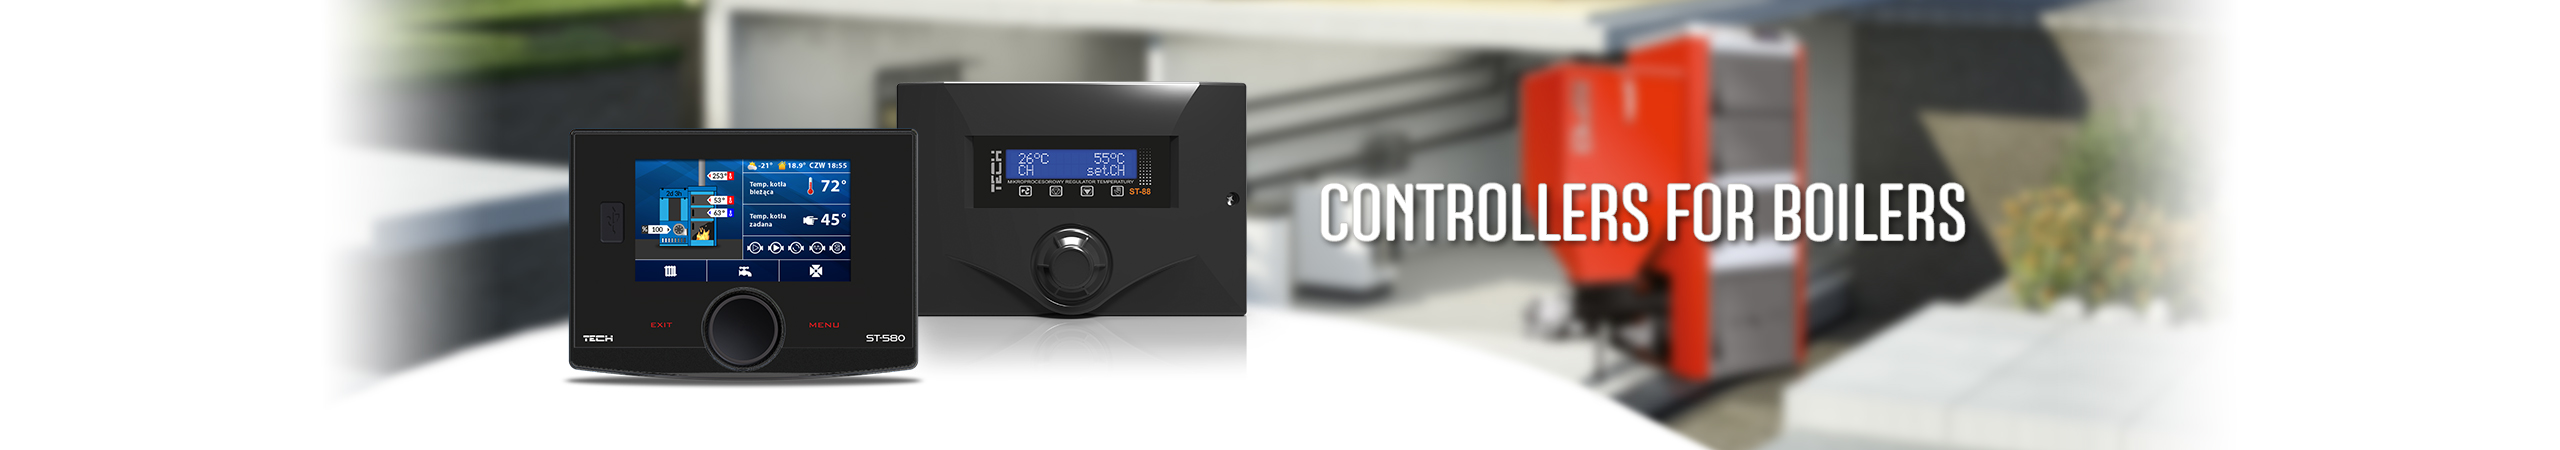 Charging boiler - TECH Sterowniki